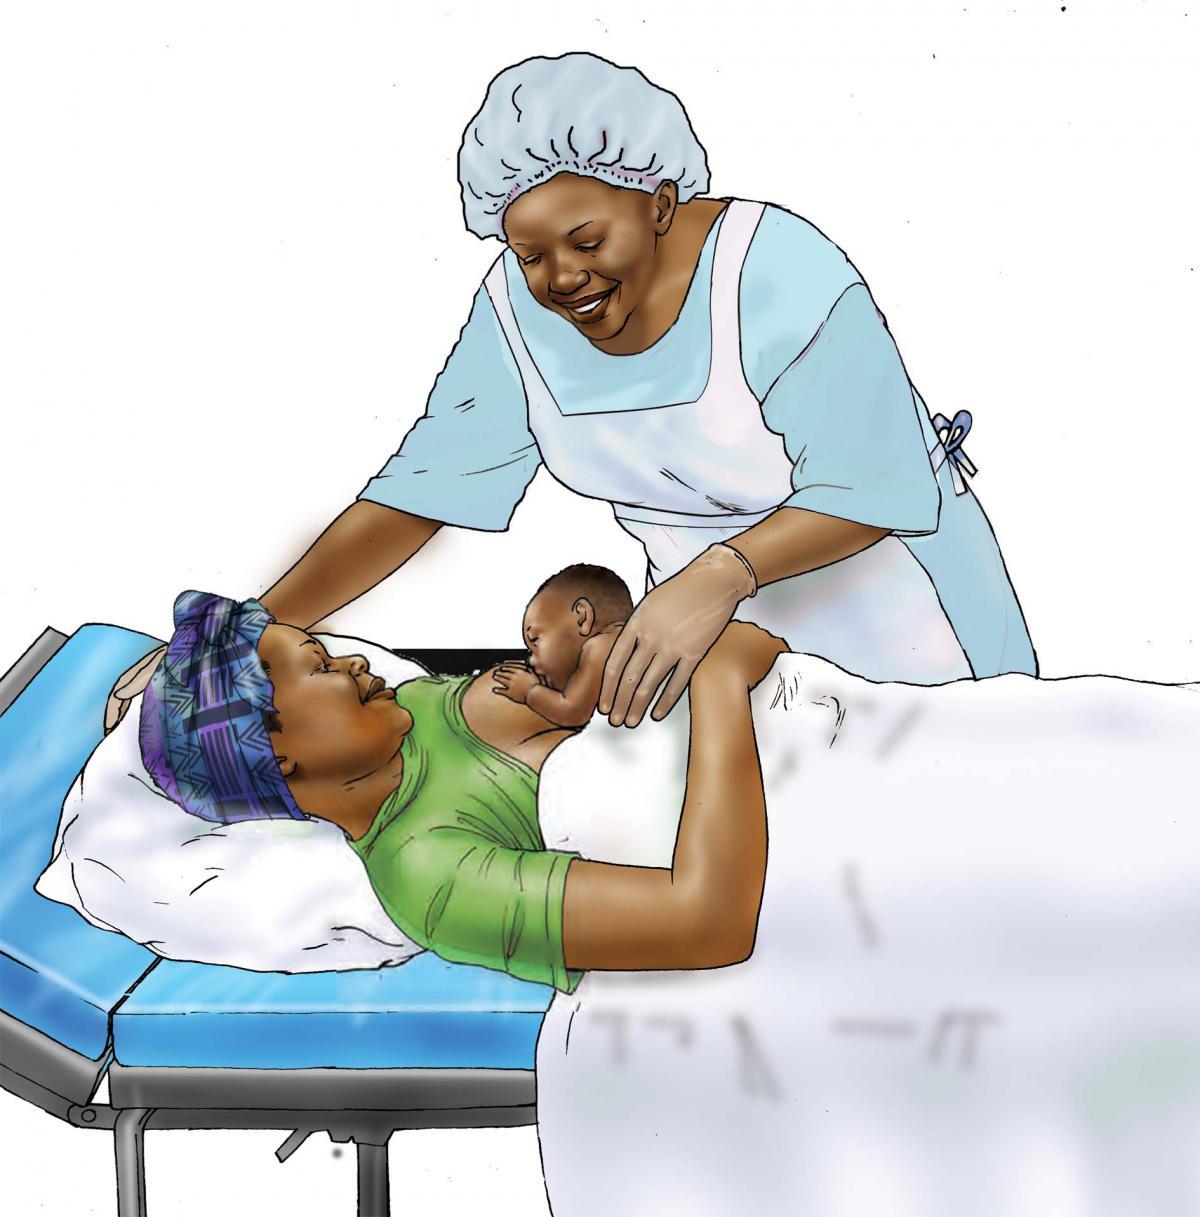 Breastfeeding - Early initiation of breastfeeding 0-6 mo - 01D - Niger